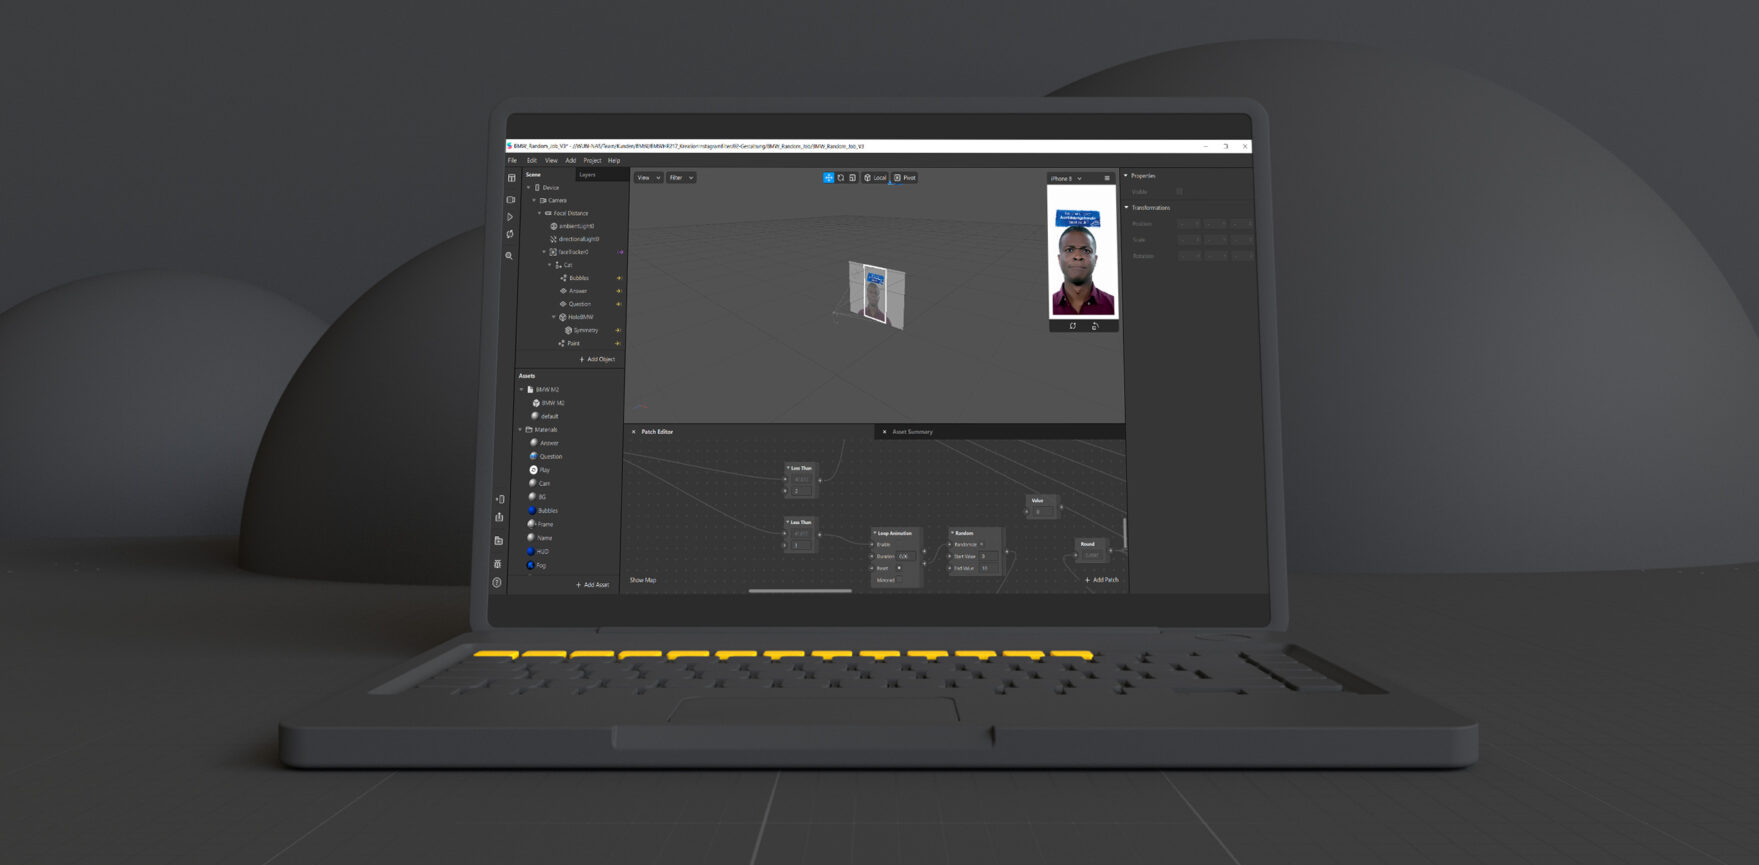 Instagram Filter Creation Laptop